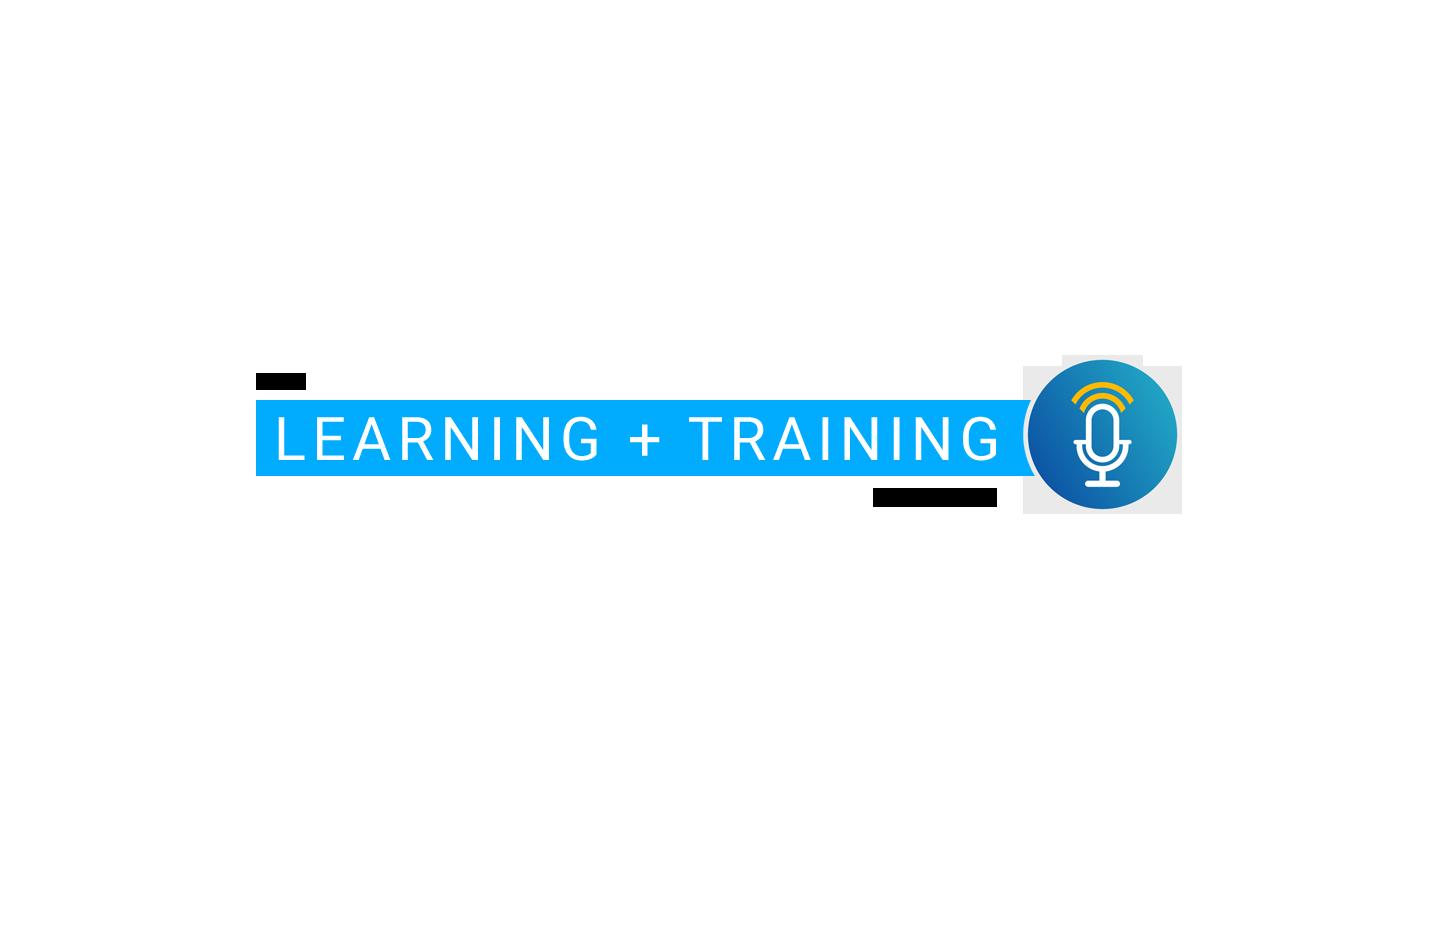 Learning-+-Training-masthead-podcast-logo